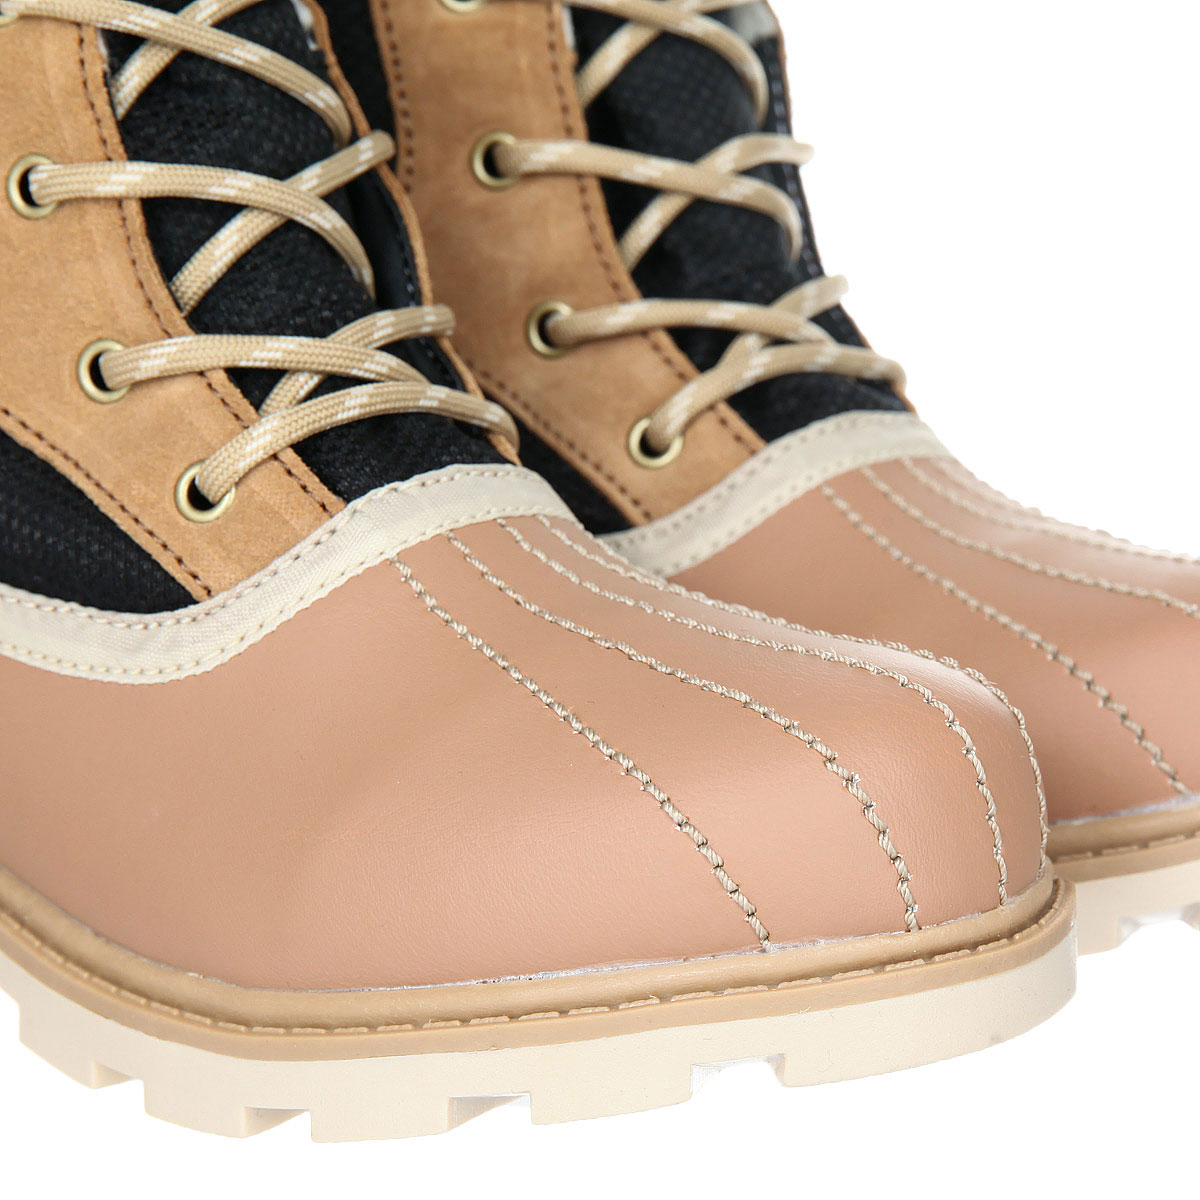 4fd0092ae2f2 Купить ботинки зимние женские Roxy Canby Boot Black (ARJB700547-BLK ...